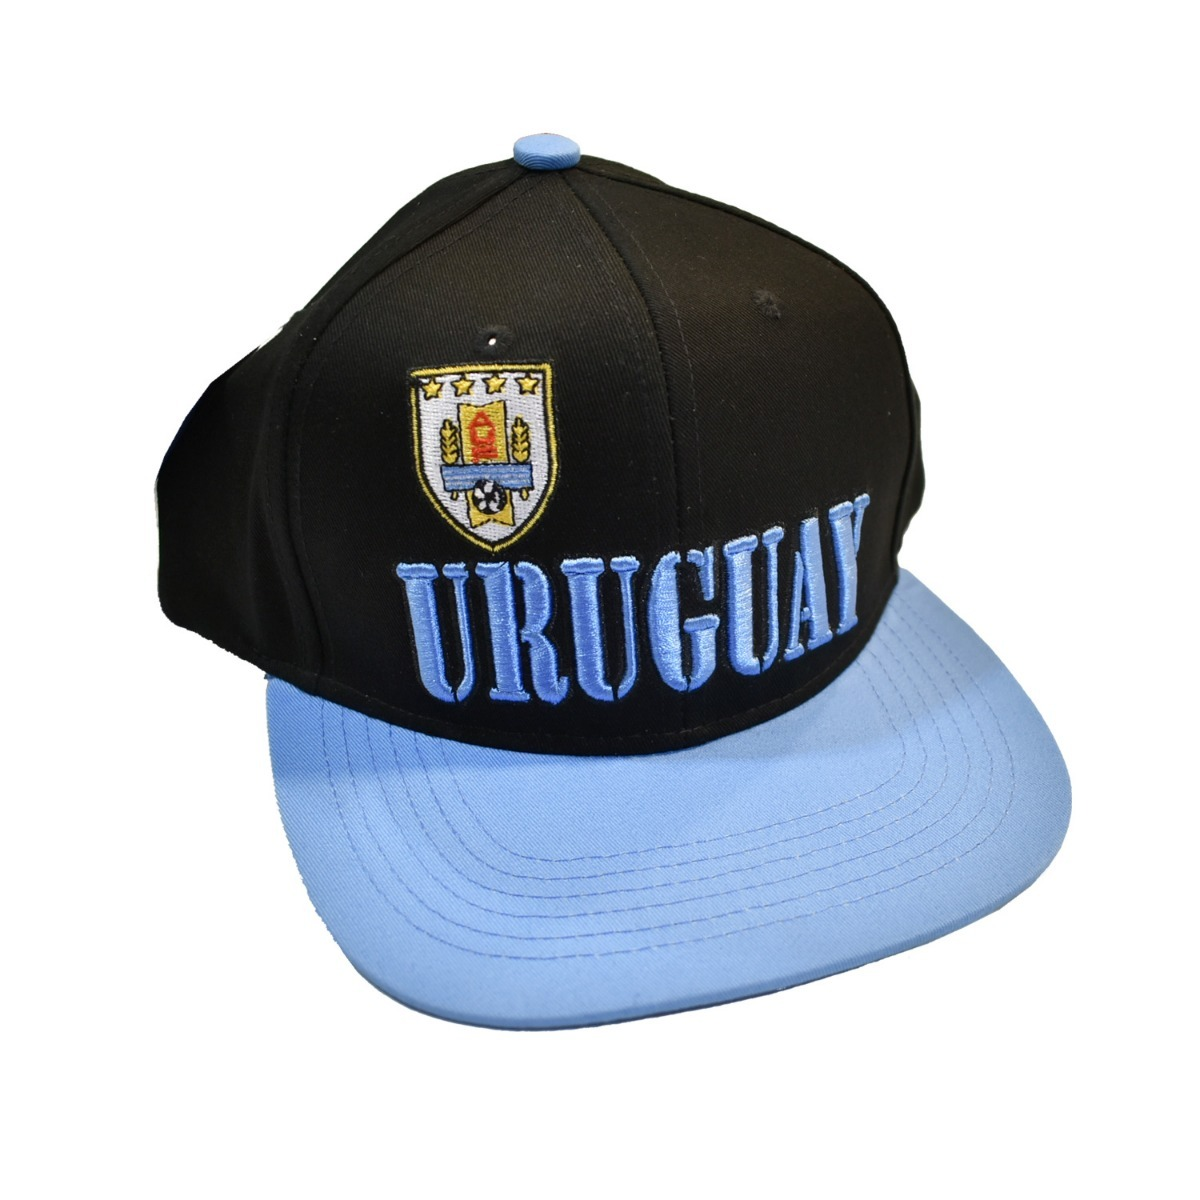 0570fe8440670 Gorro uruguay visera plana en mercado libre jpg 1200x1200 Gorro uruguay